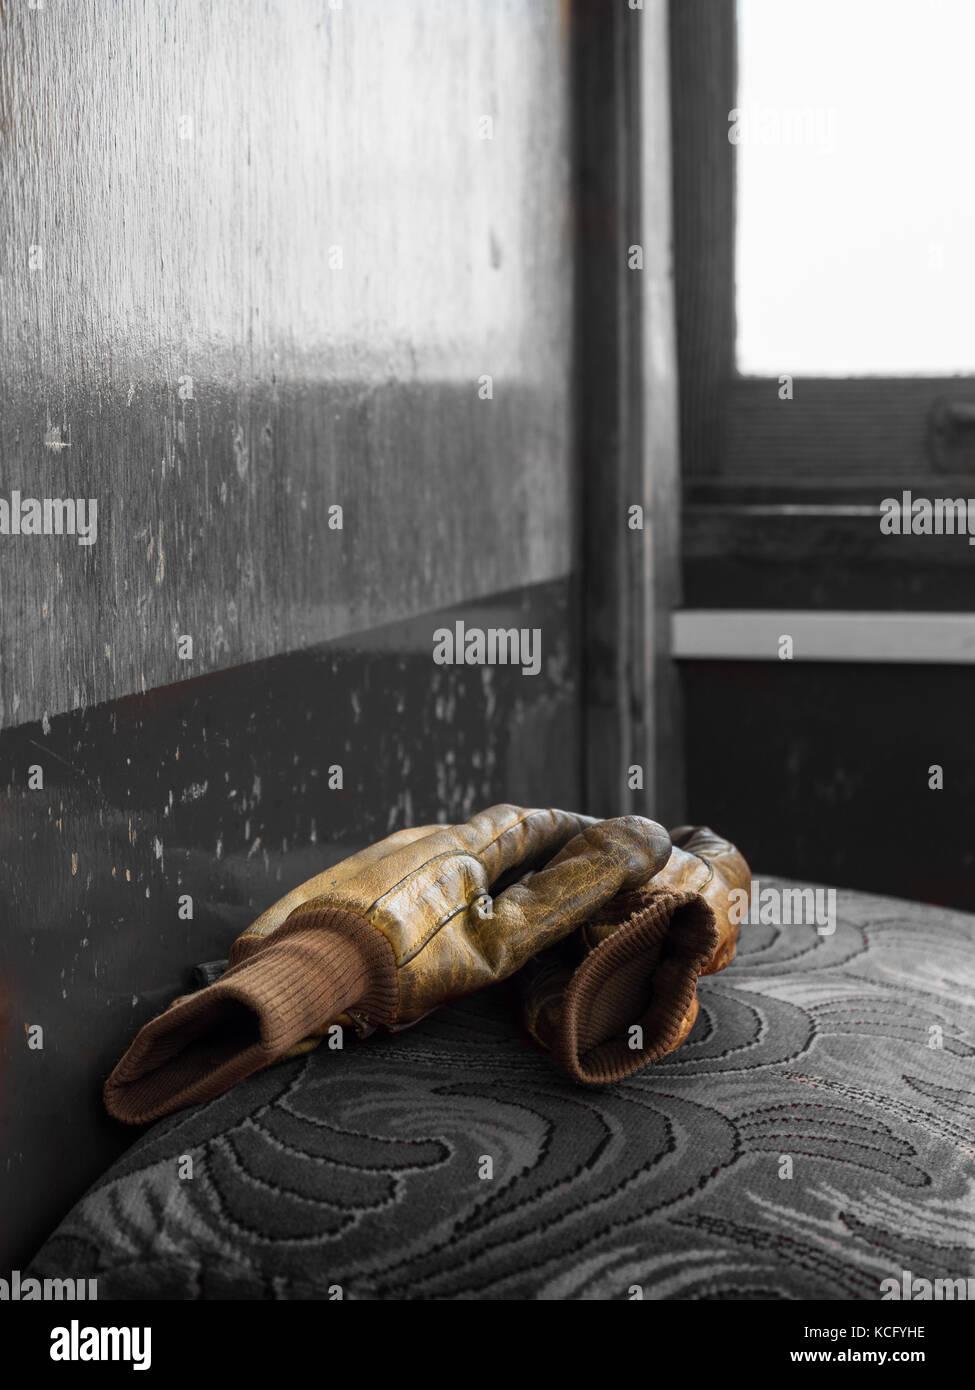 Tram driver's gloves, Manx Electric Railway, Isle of Man. - Stock Image